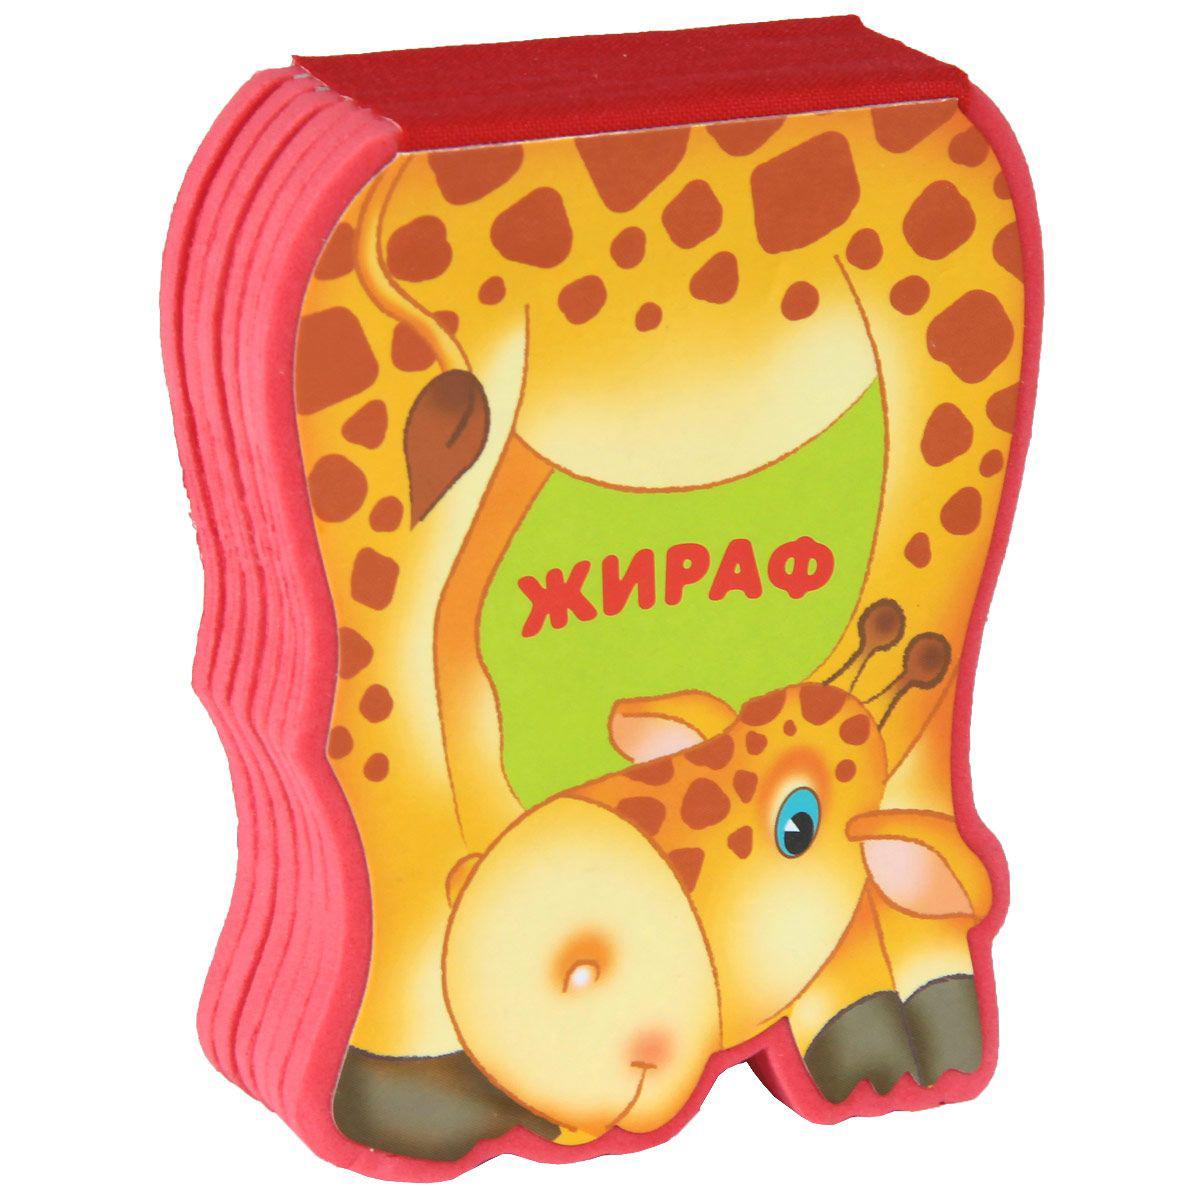 Книжка–плюшка из серии Забавные зверушки - ЖирафКнижки-малышки<br>Книжка–плюшка из серии Забавные зверушки - Жираф<br>